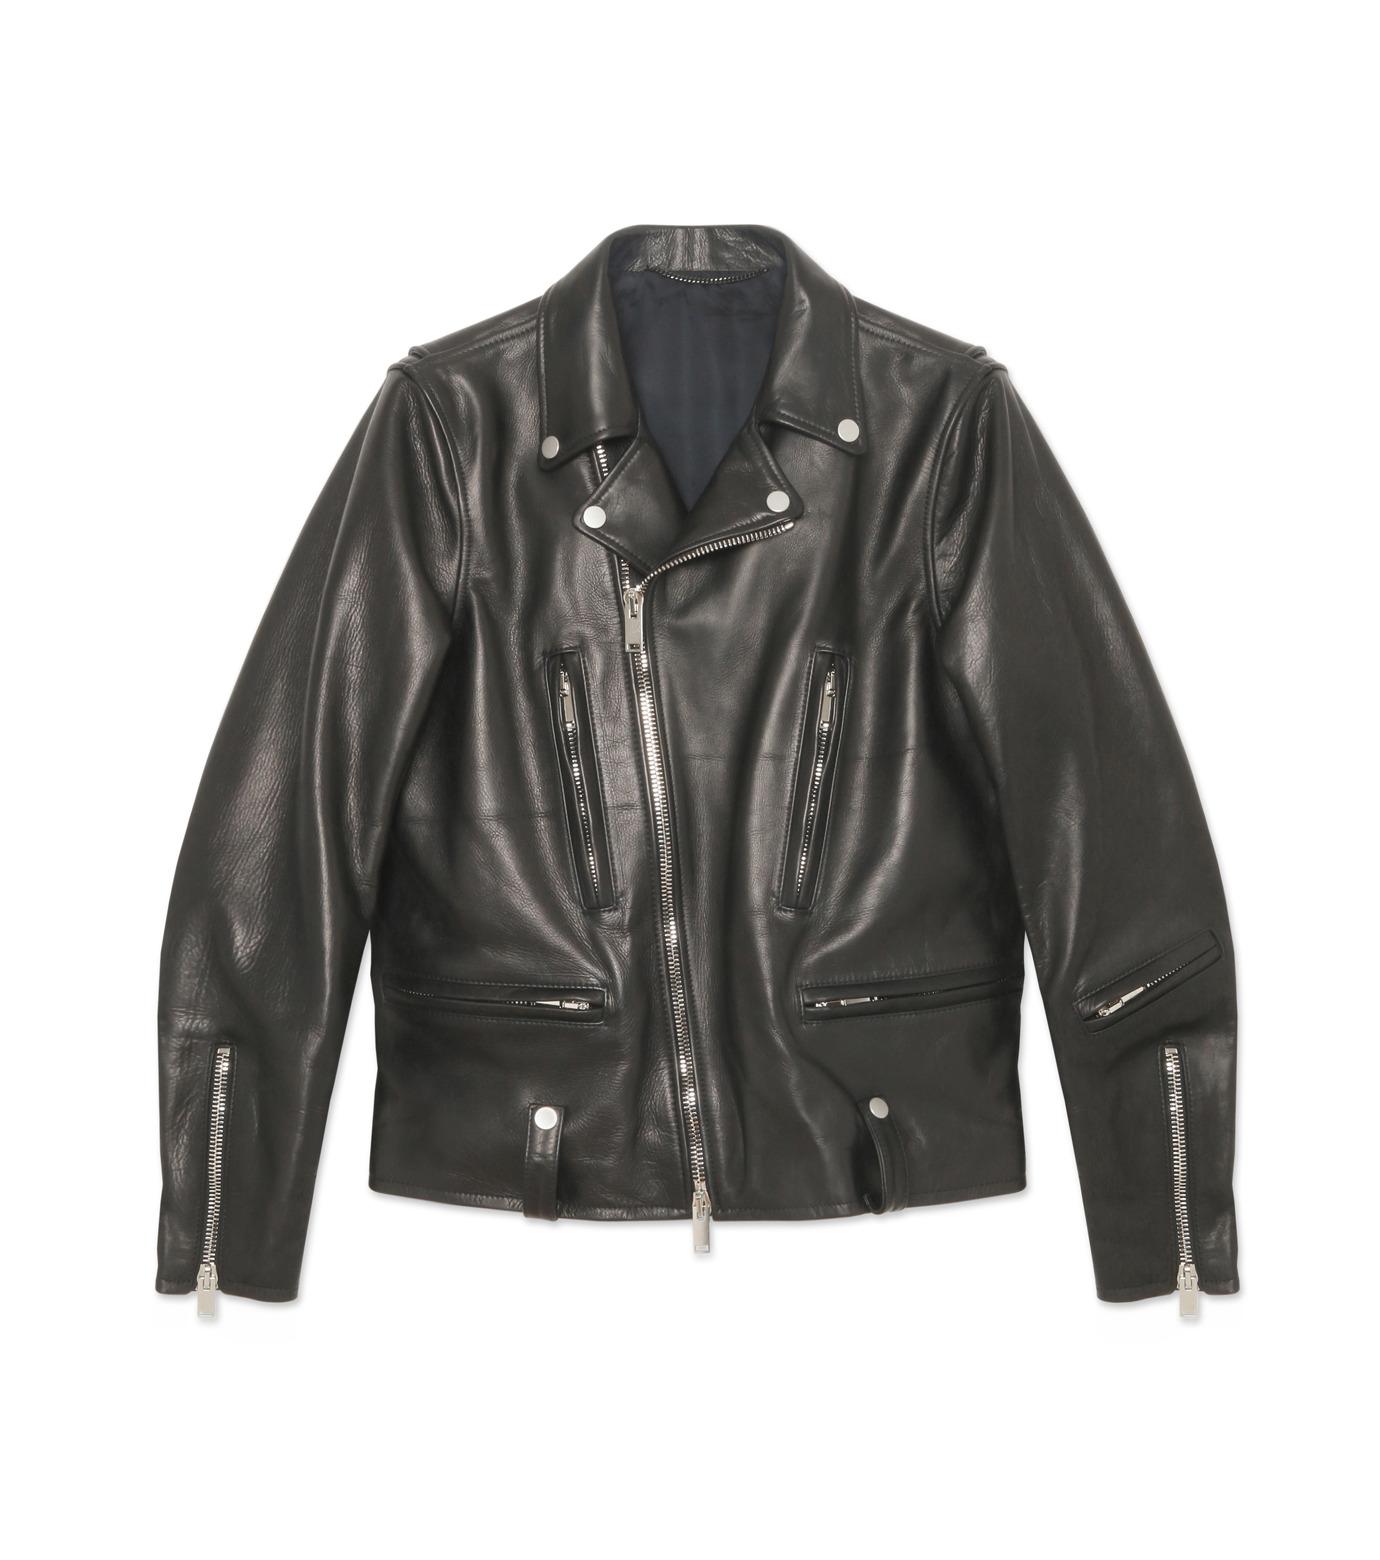 HL HEDDIE LOVU(エイチエル・エディールーヴ)のSEMI DOUBLE RIDERS JACKET-BLACK(ジャケット/jacket)-18A94001-13 拡大詳細画像1